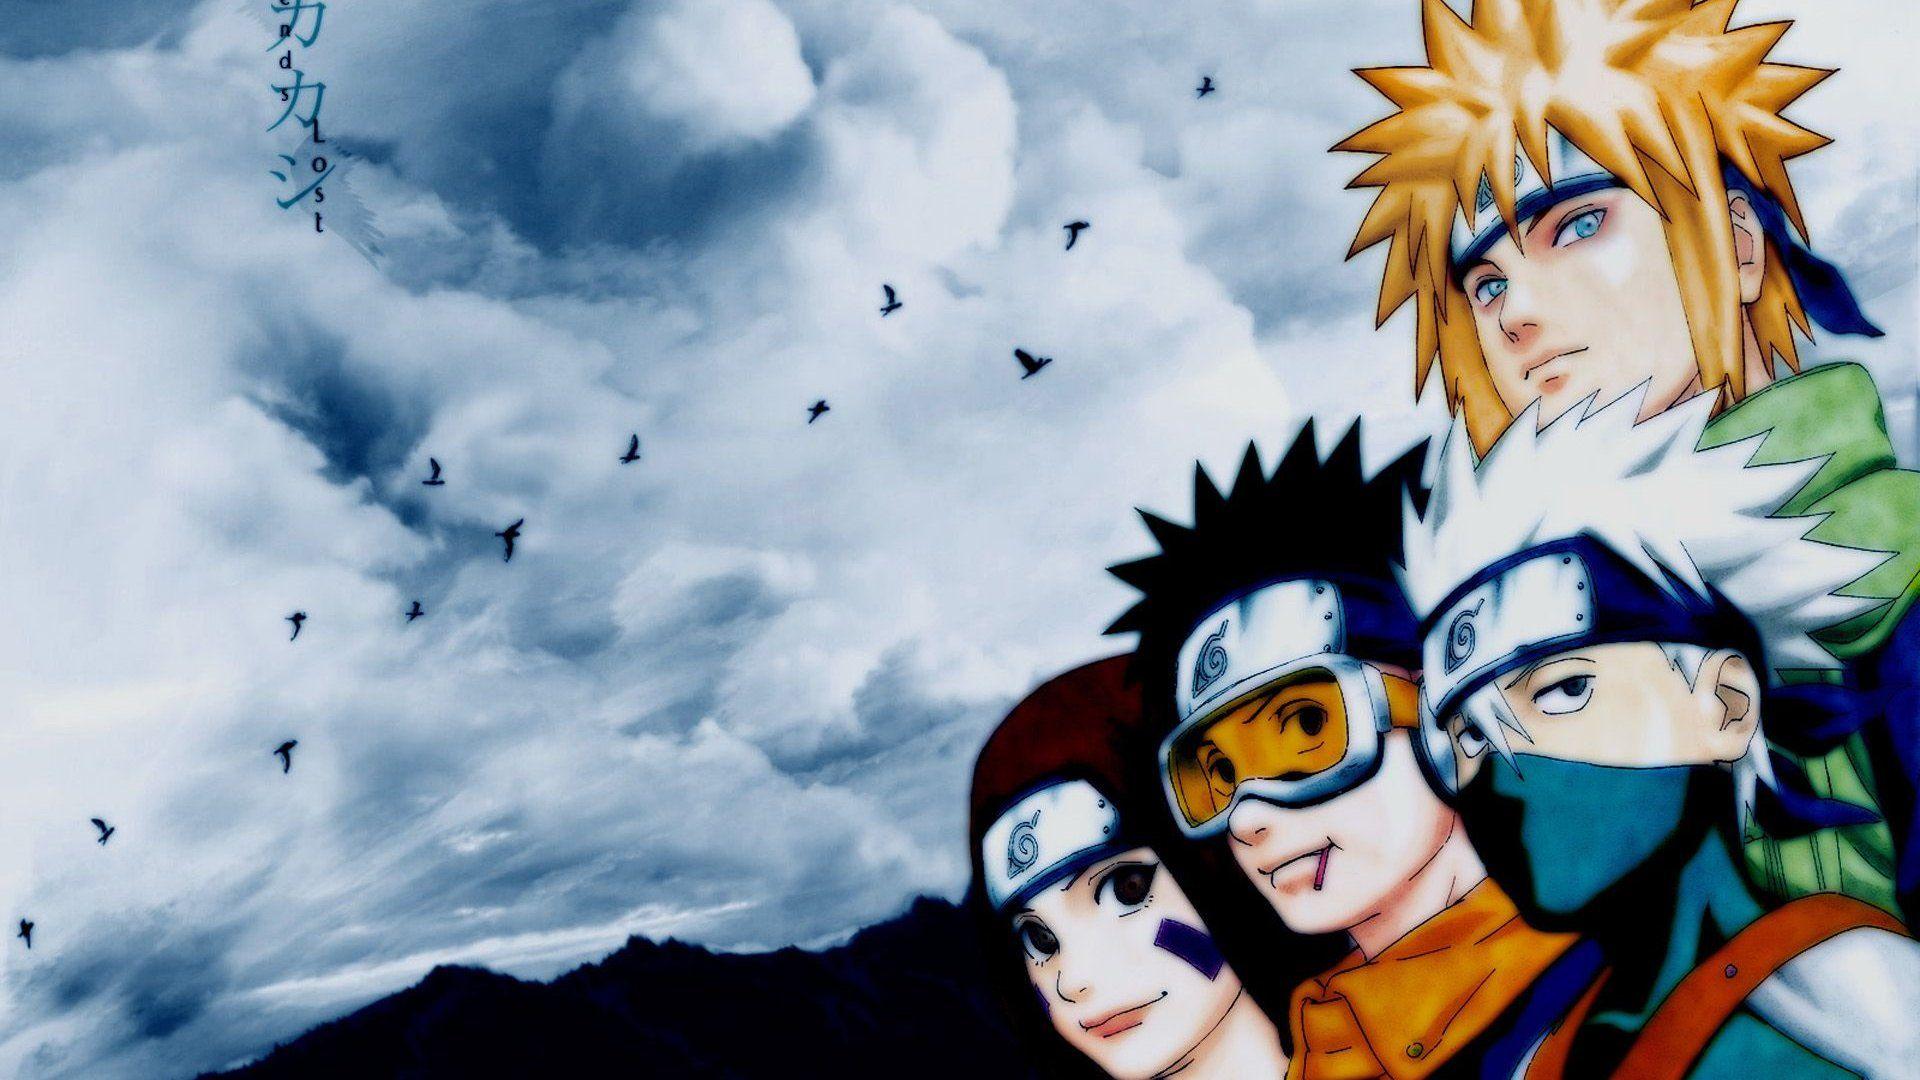 X Anime Wallpaper